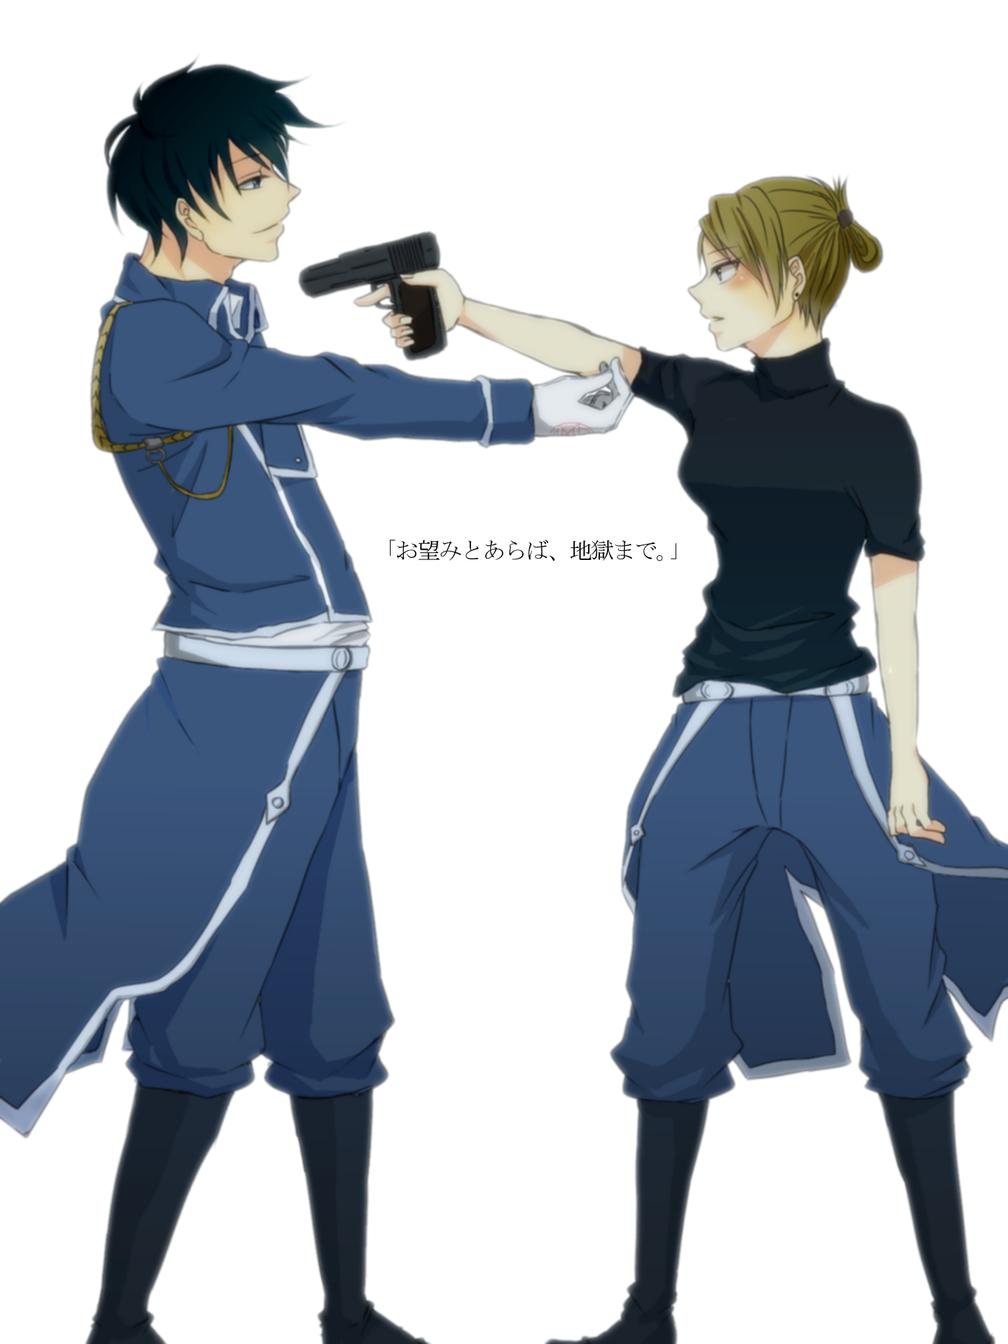 fullmetal alchemist brotherhood image #771093 - zerochan anime